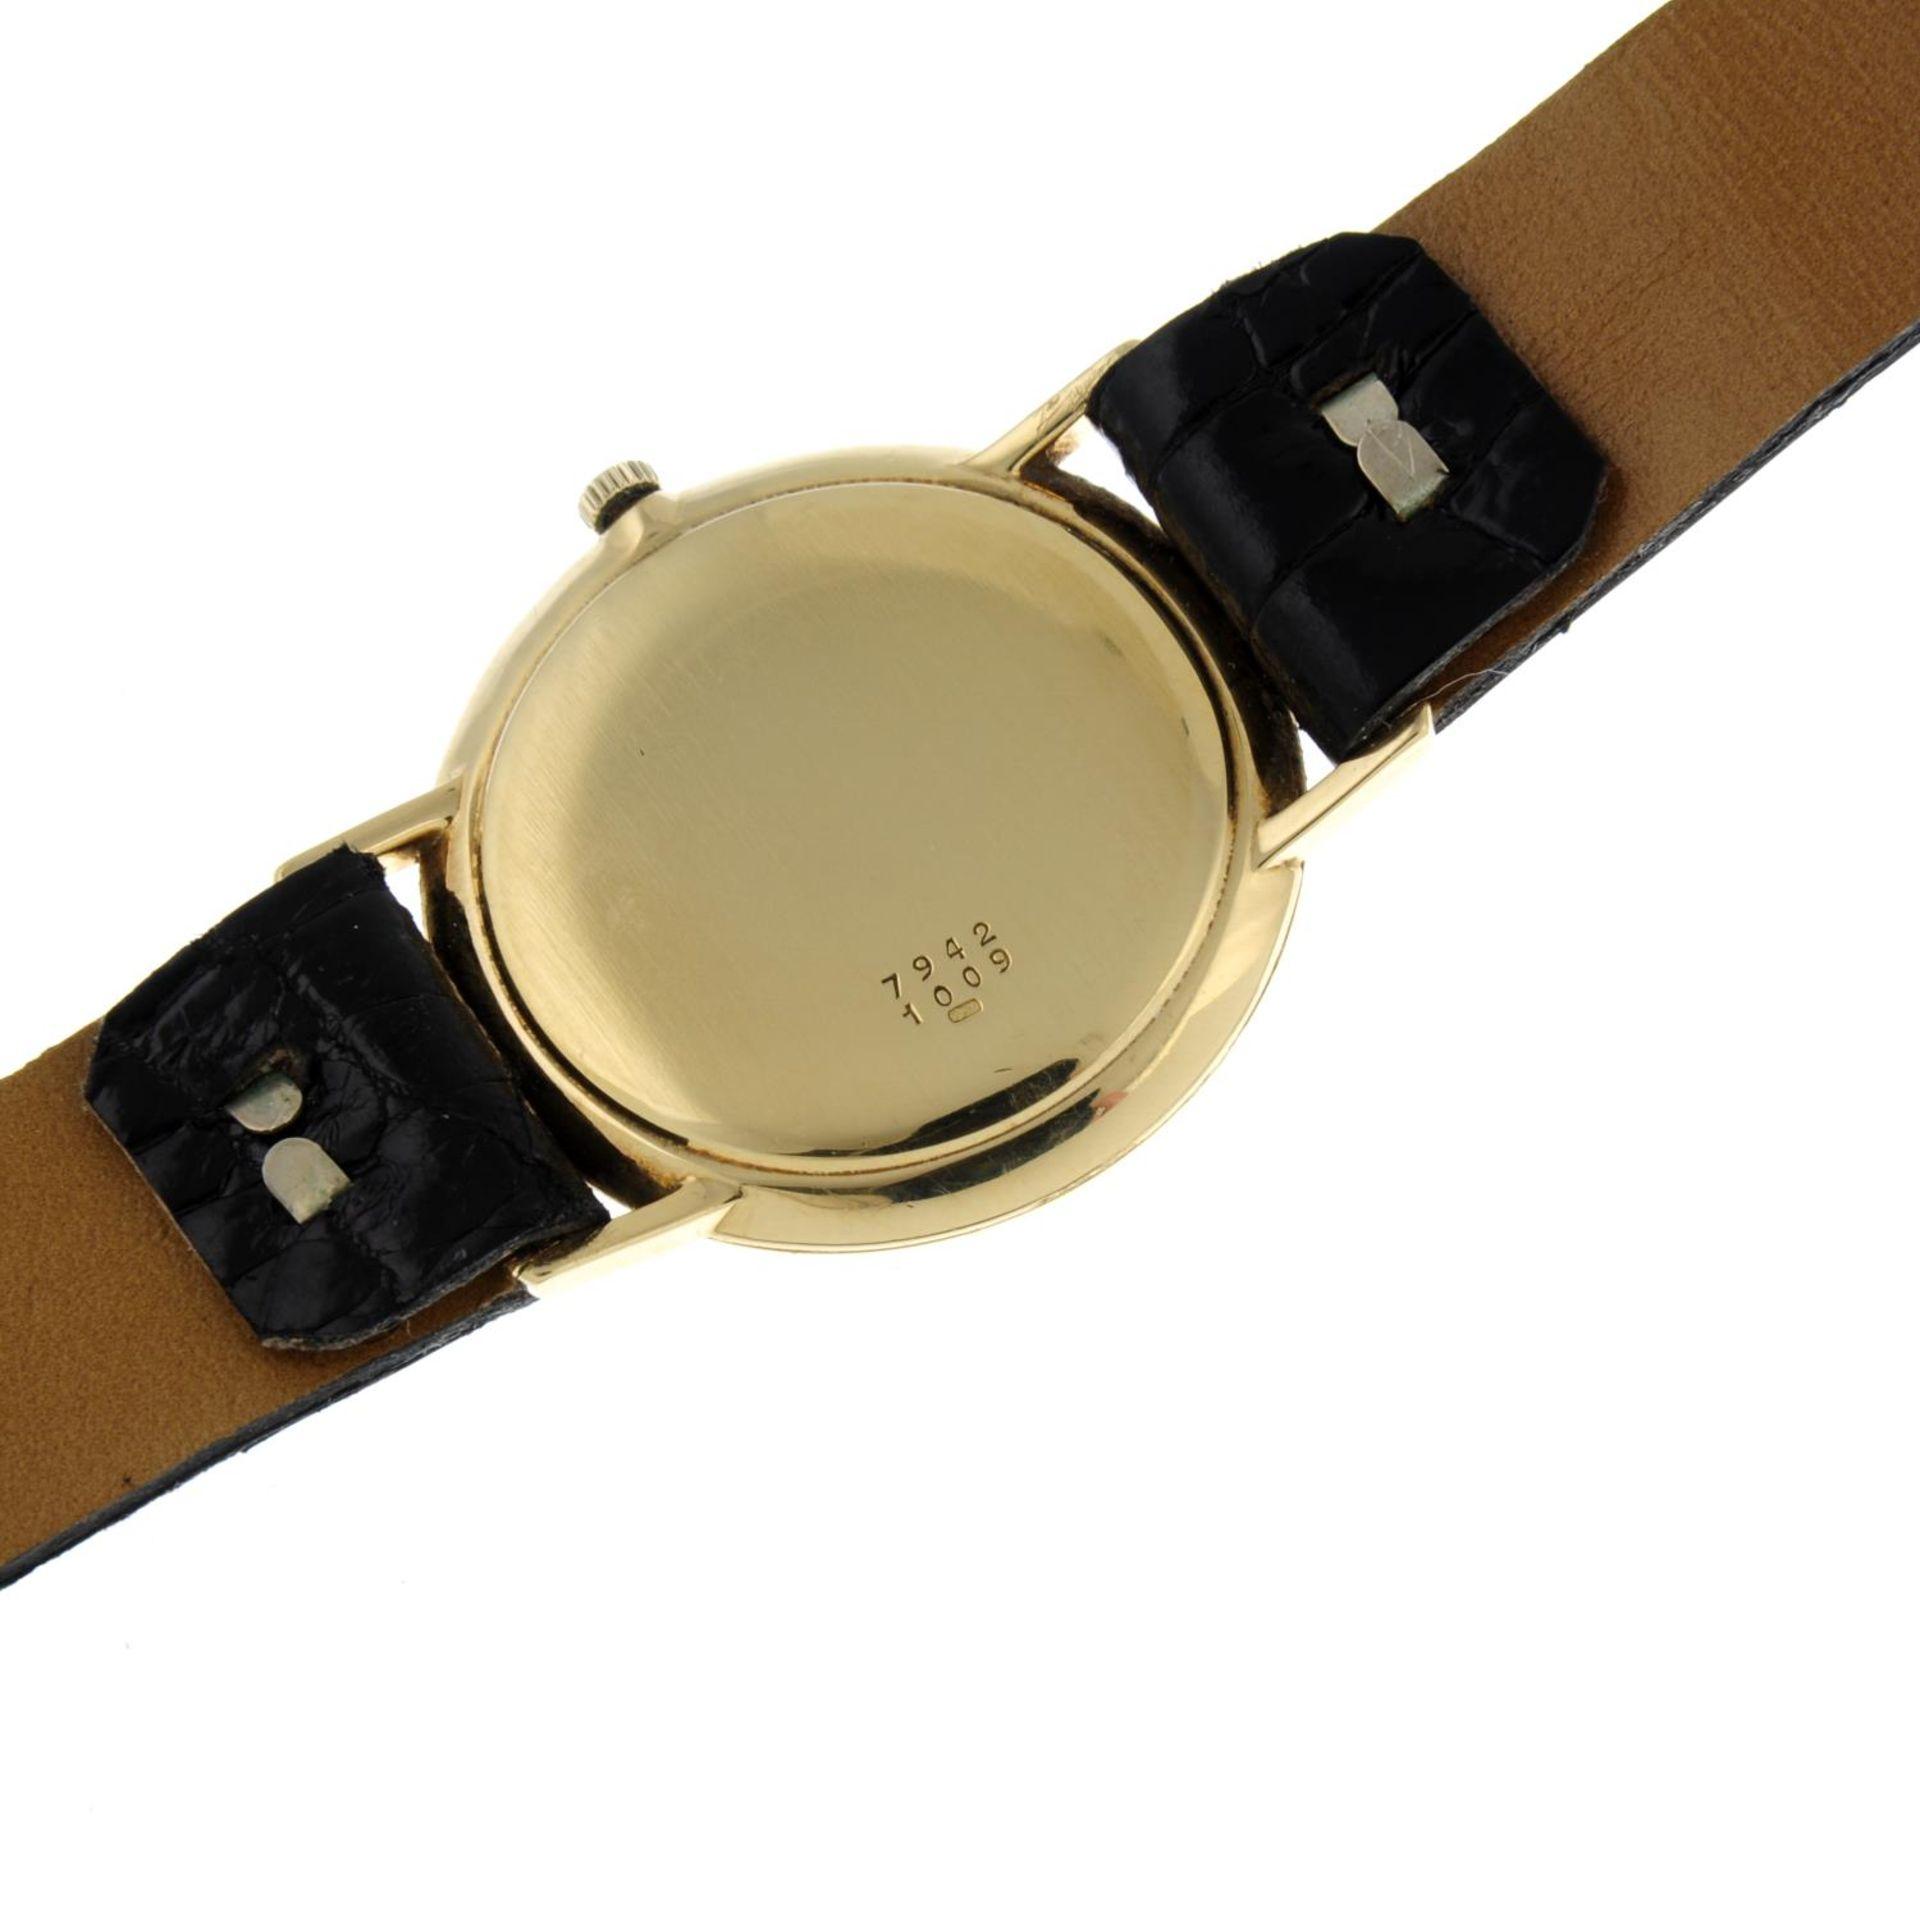 CHOPARD - a wrist watch. - Bild 5 aus 5